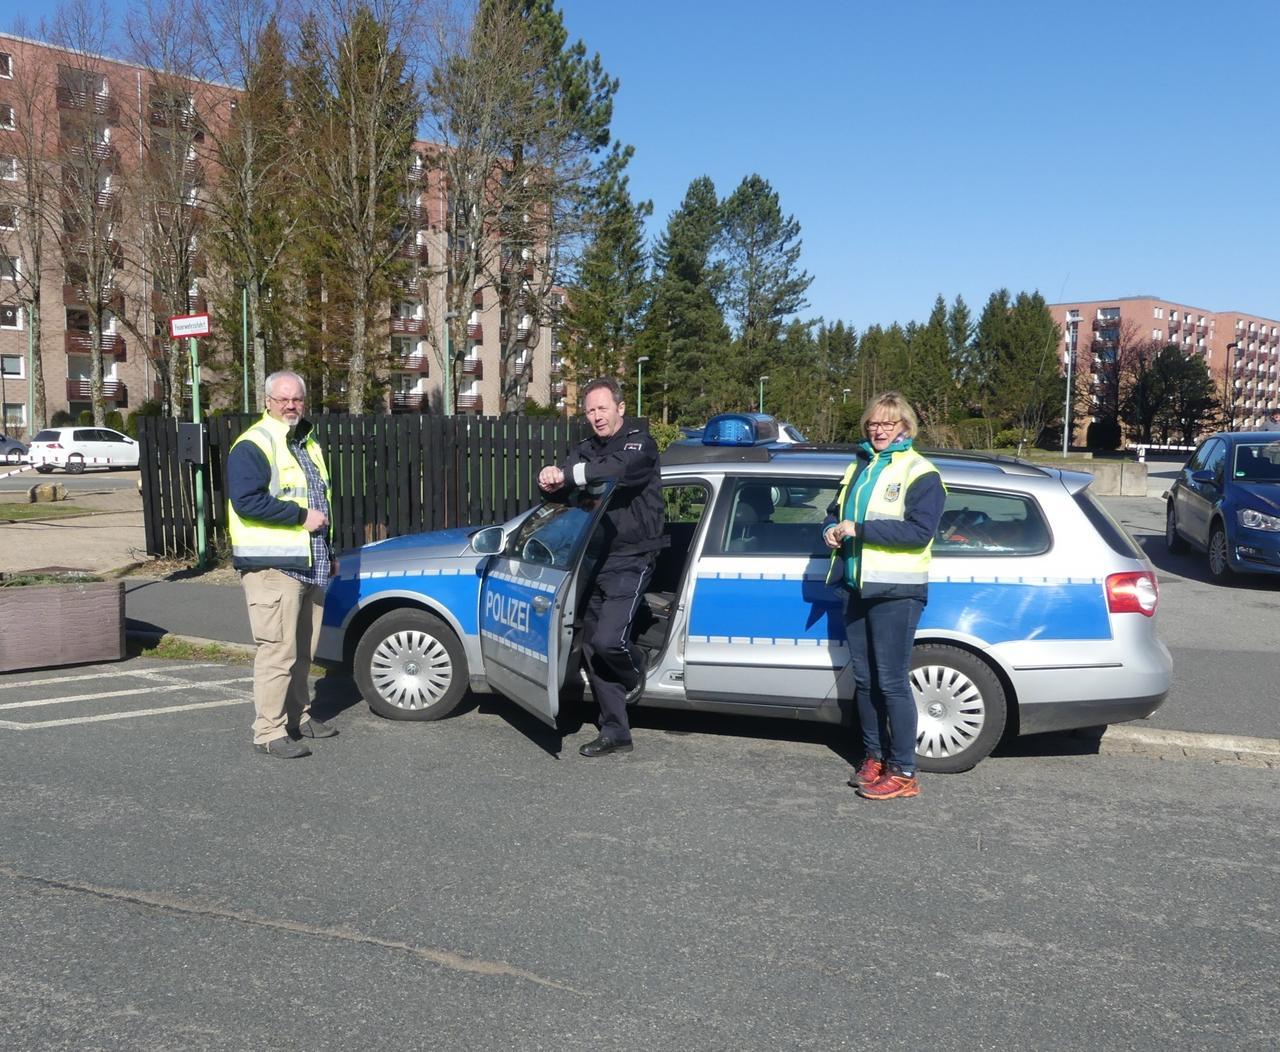 Gäste müssen den Harz verlassen